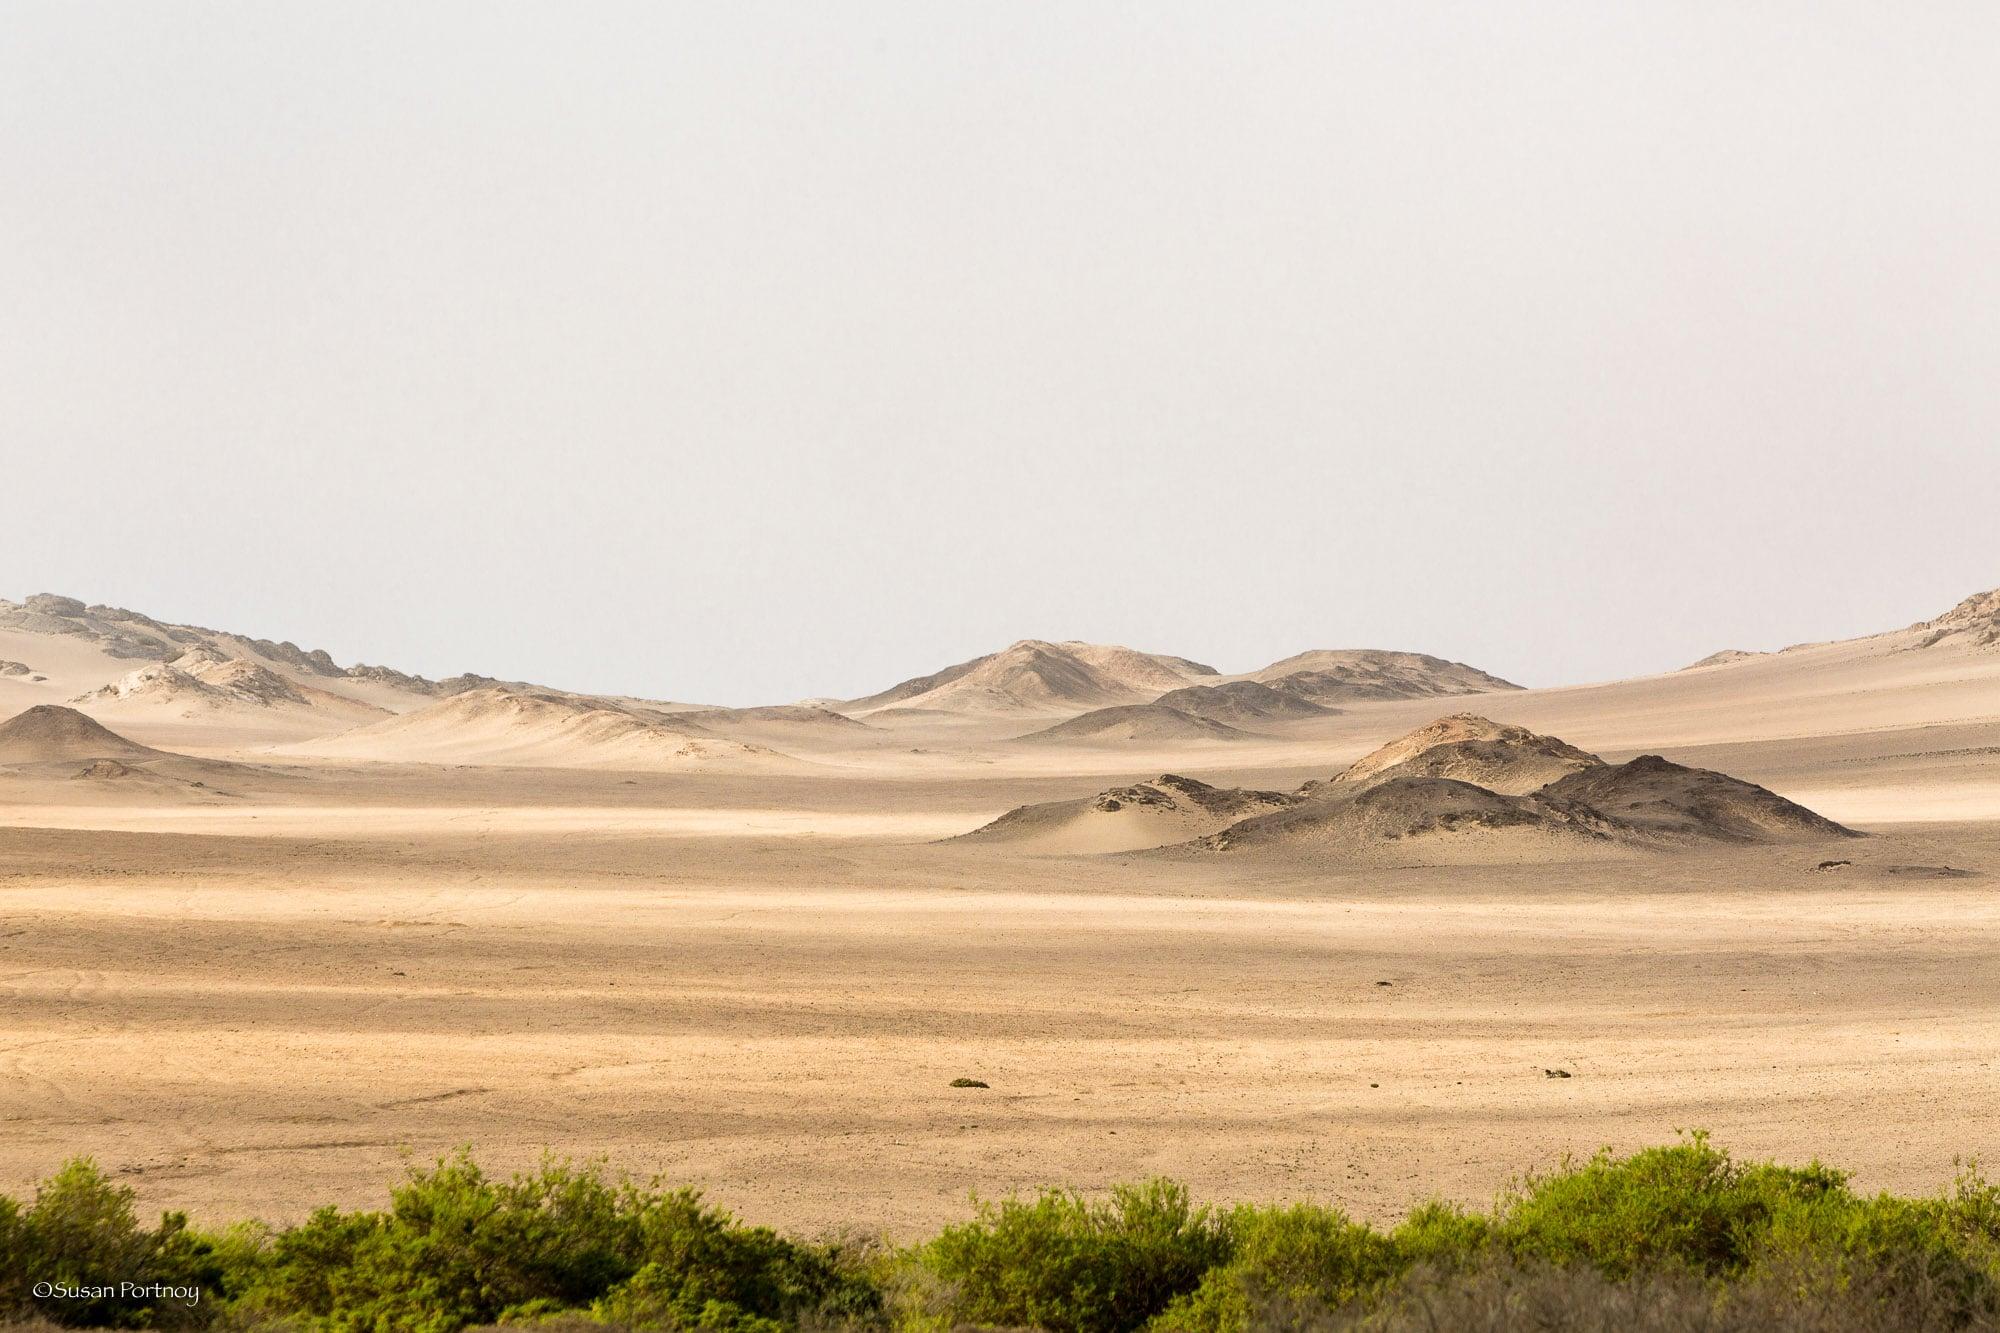 Dunes on the way to the Skeleton Coast